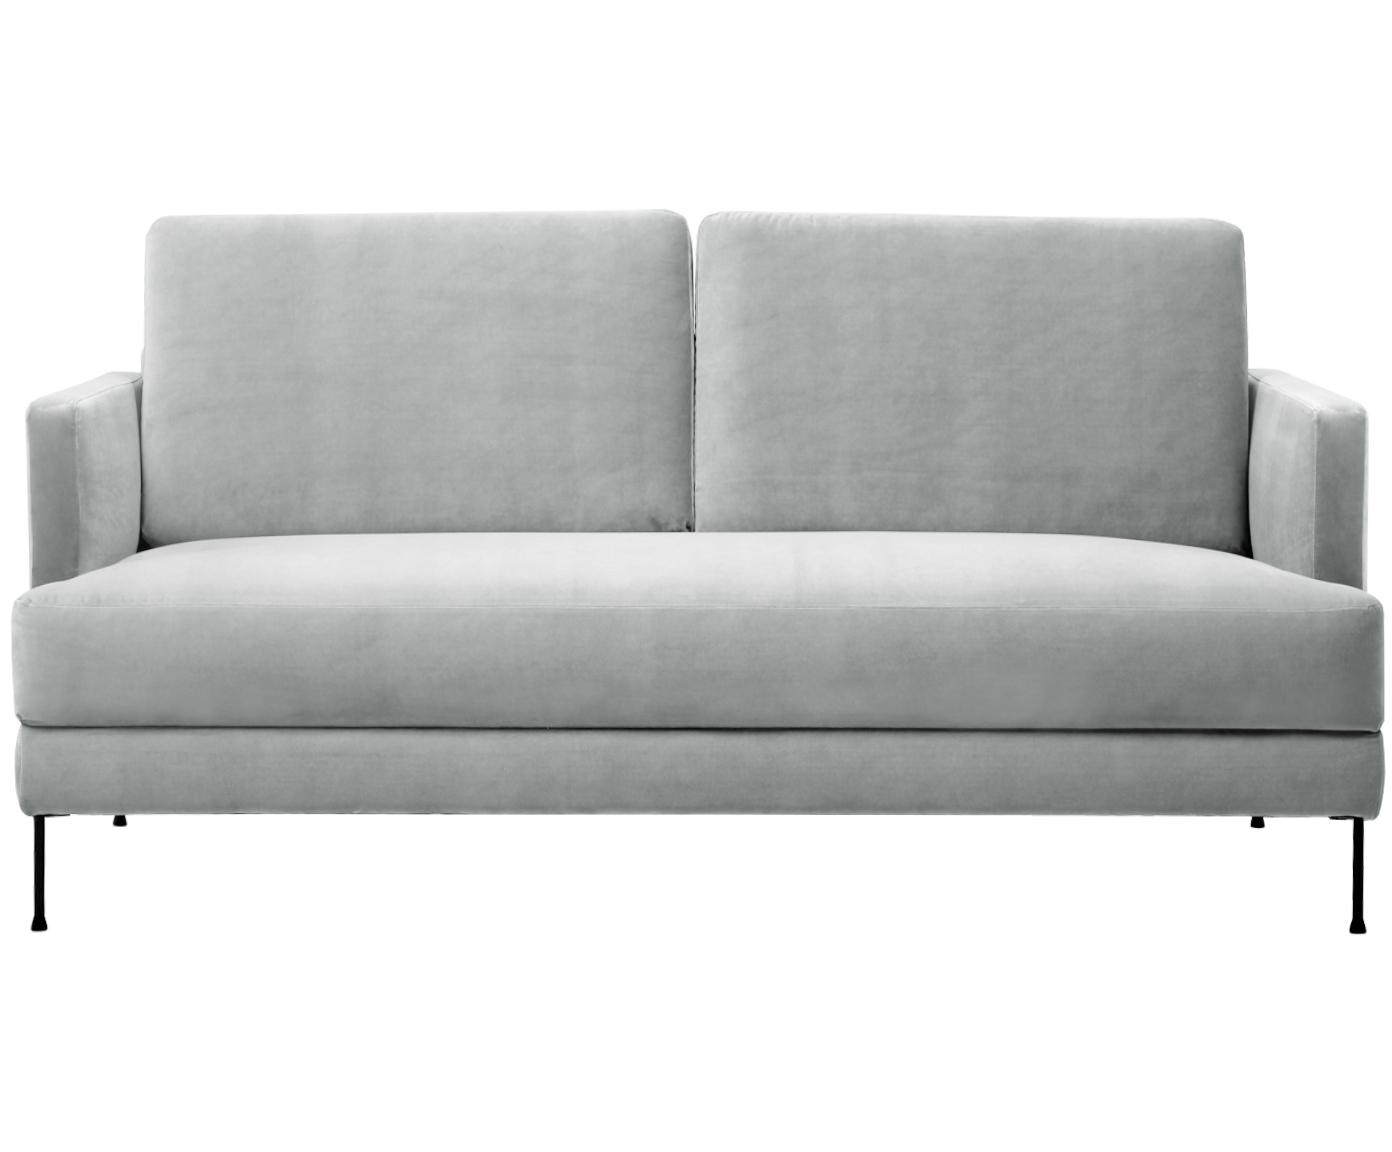 Samt-Sofa Fluente (2-Sitzer), Bezug: Samt (Hochwertiger Polyes, Gestell: Massives Kiefernholz, Samt Hellgrau, B 168 x T 83 cm